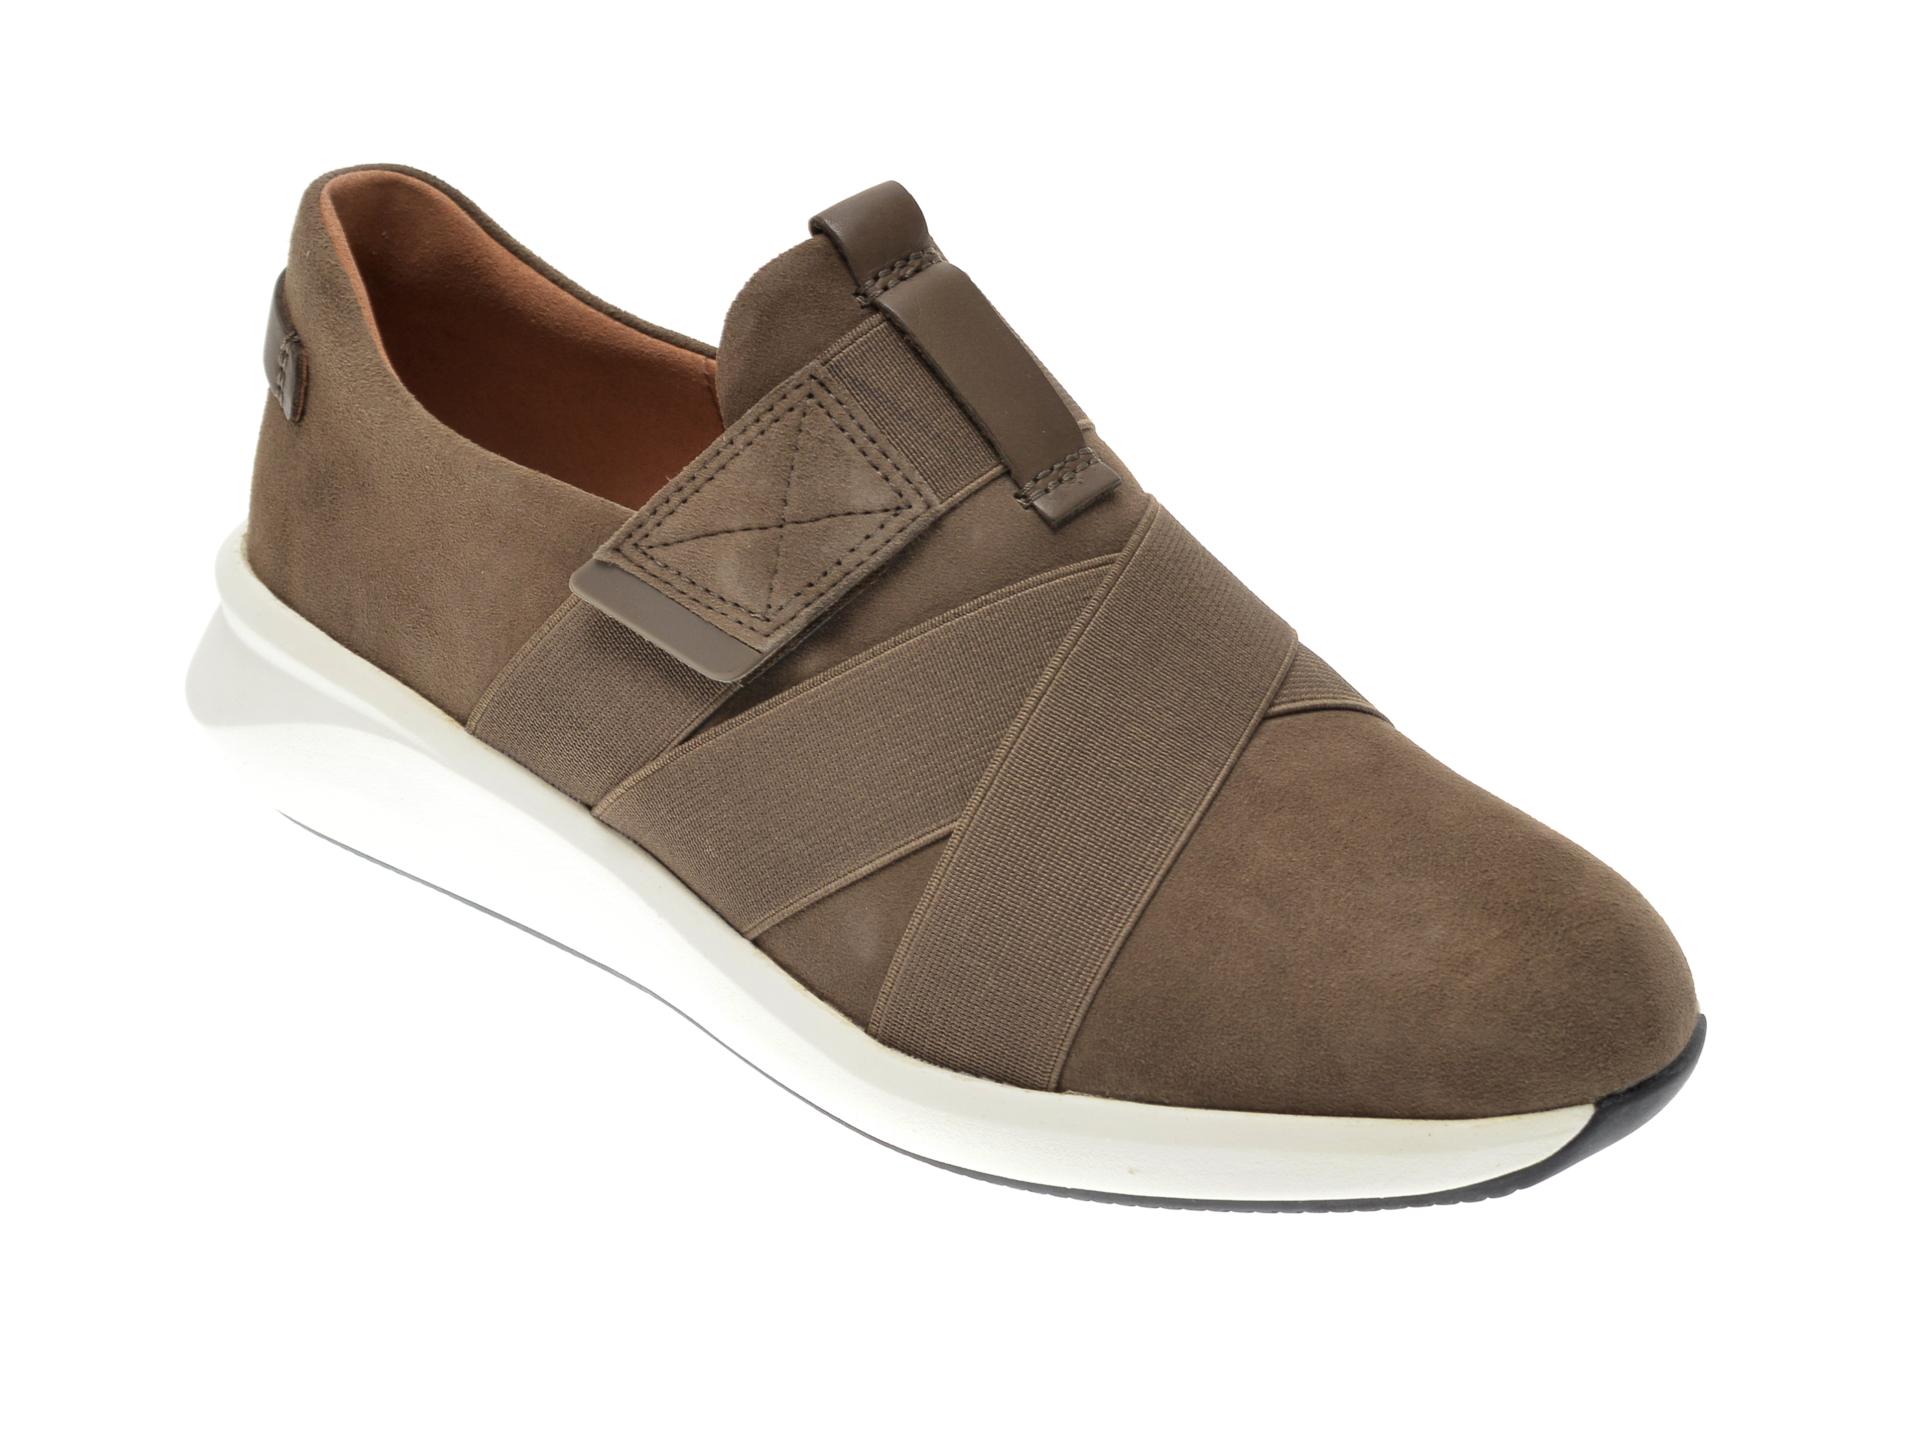 Pantofi CLARKS kaki, UN RIO STRAP, din material textil si piele intoarsa imagine